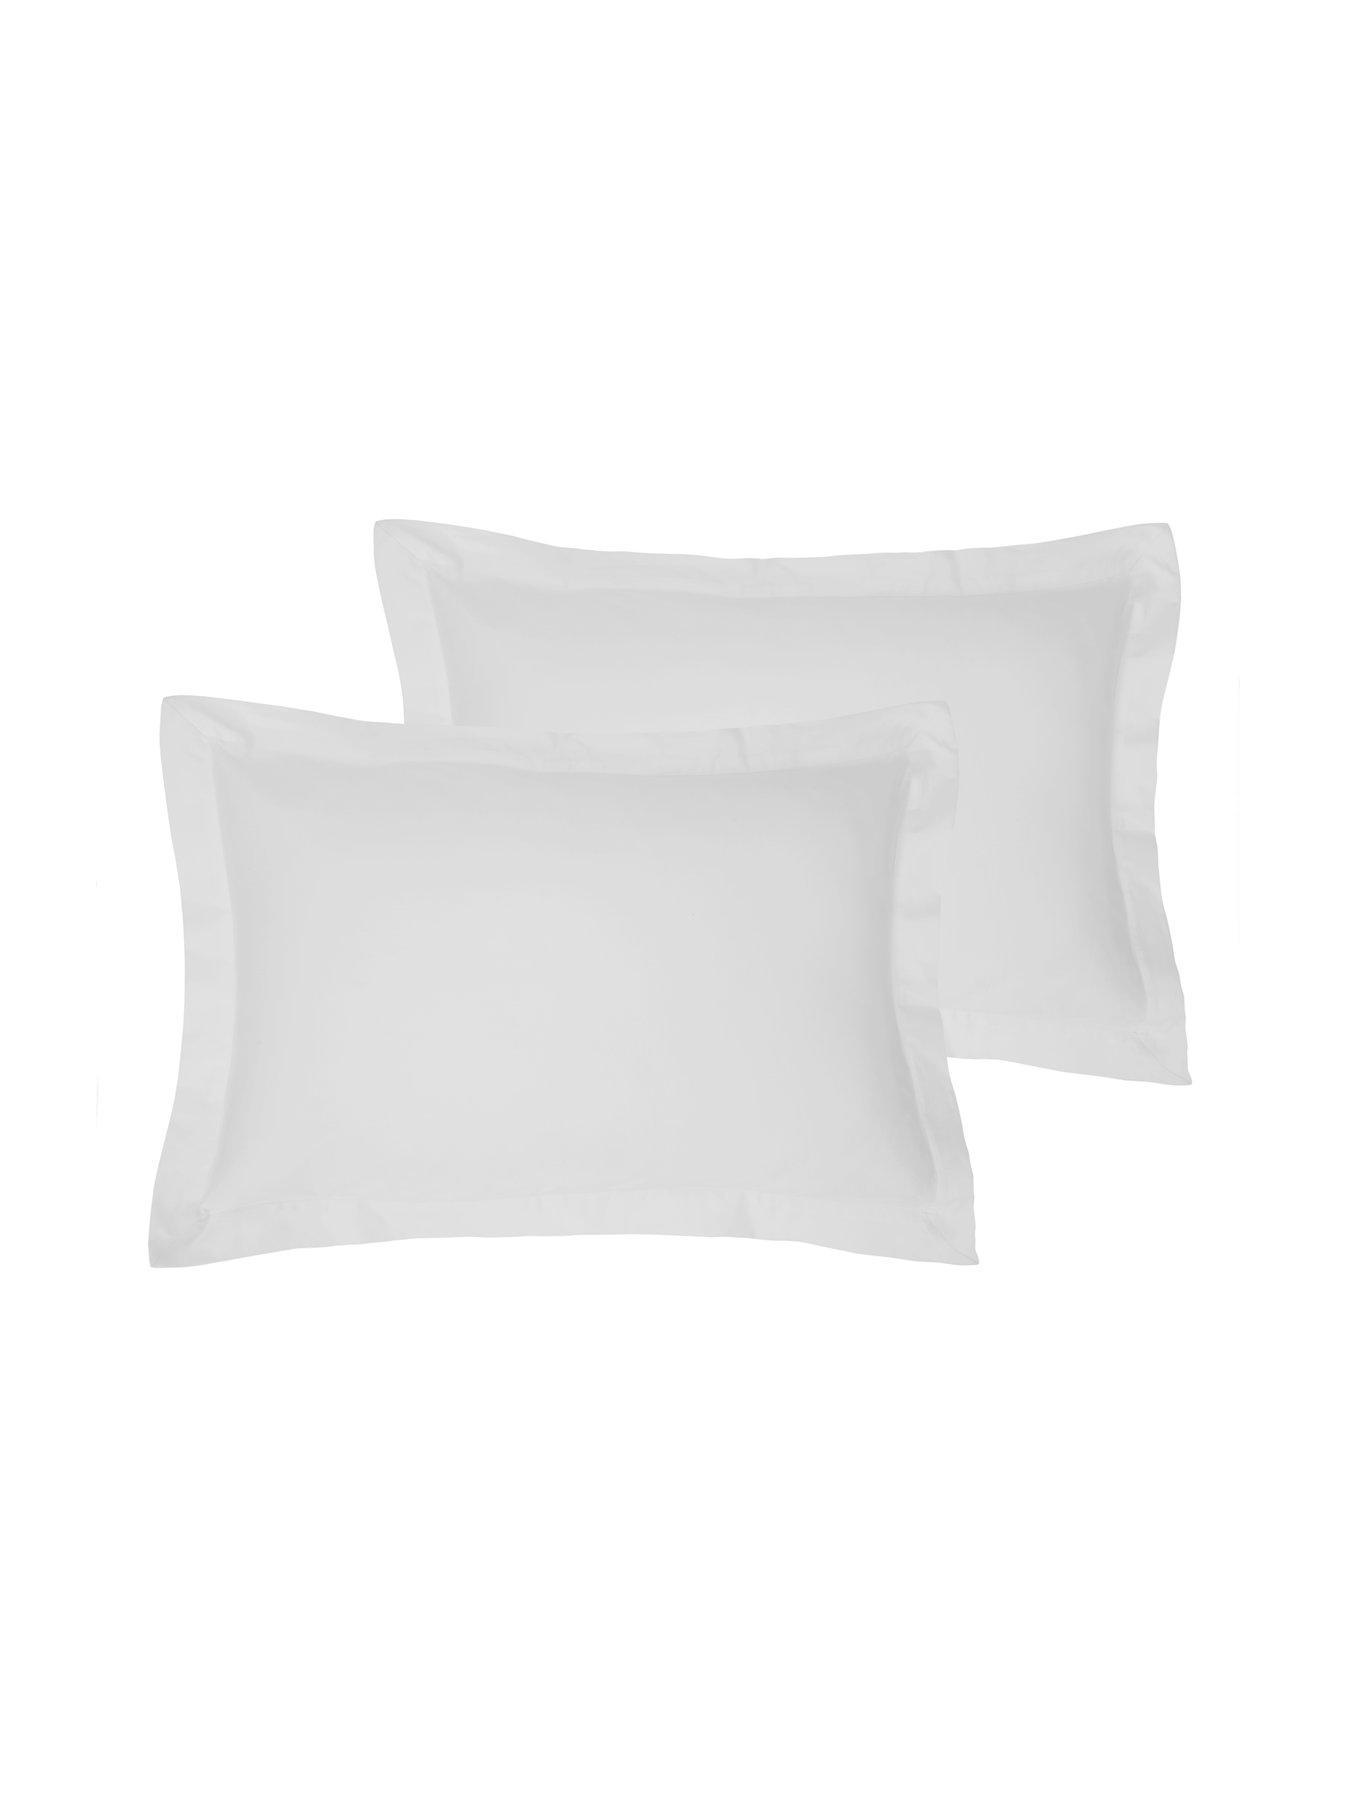 Hotel Collection Unisex stripe housewife pillowcase pair Pillowcase Cotton